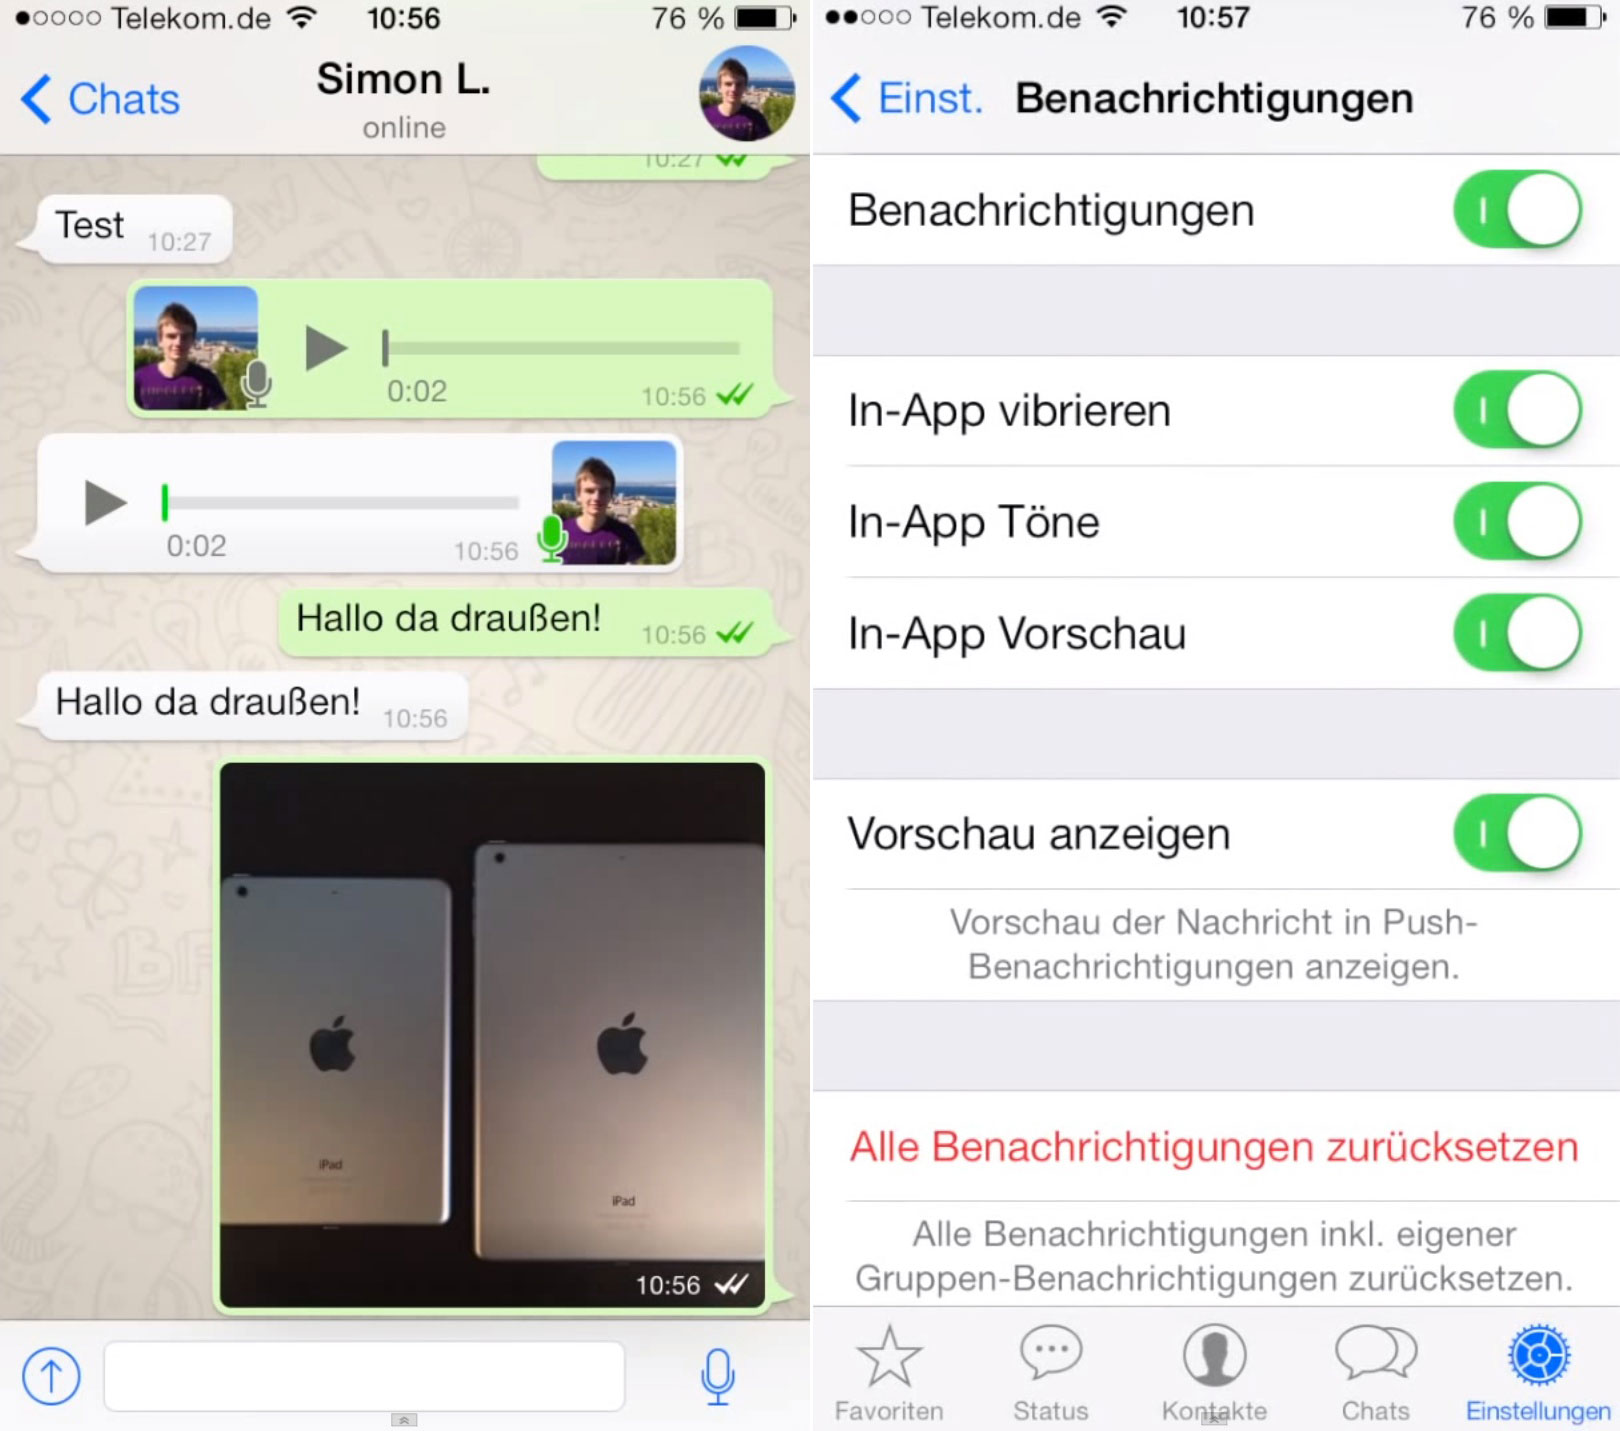 WhatsApp iOS 7 uodate image 001 WhatsApp pour iOS 7 en vidéo